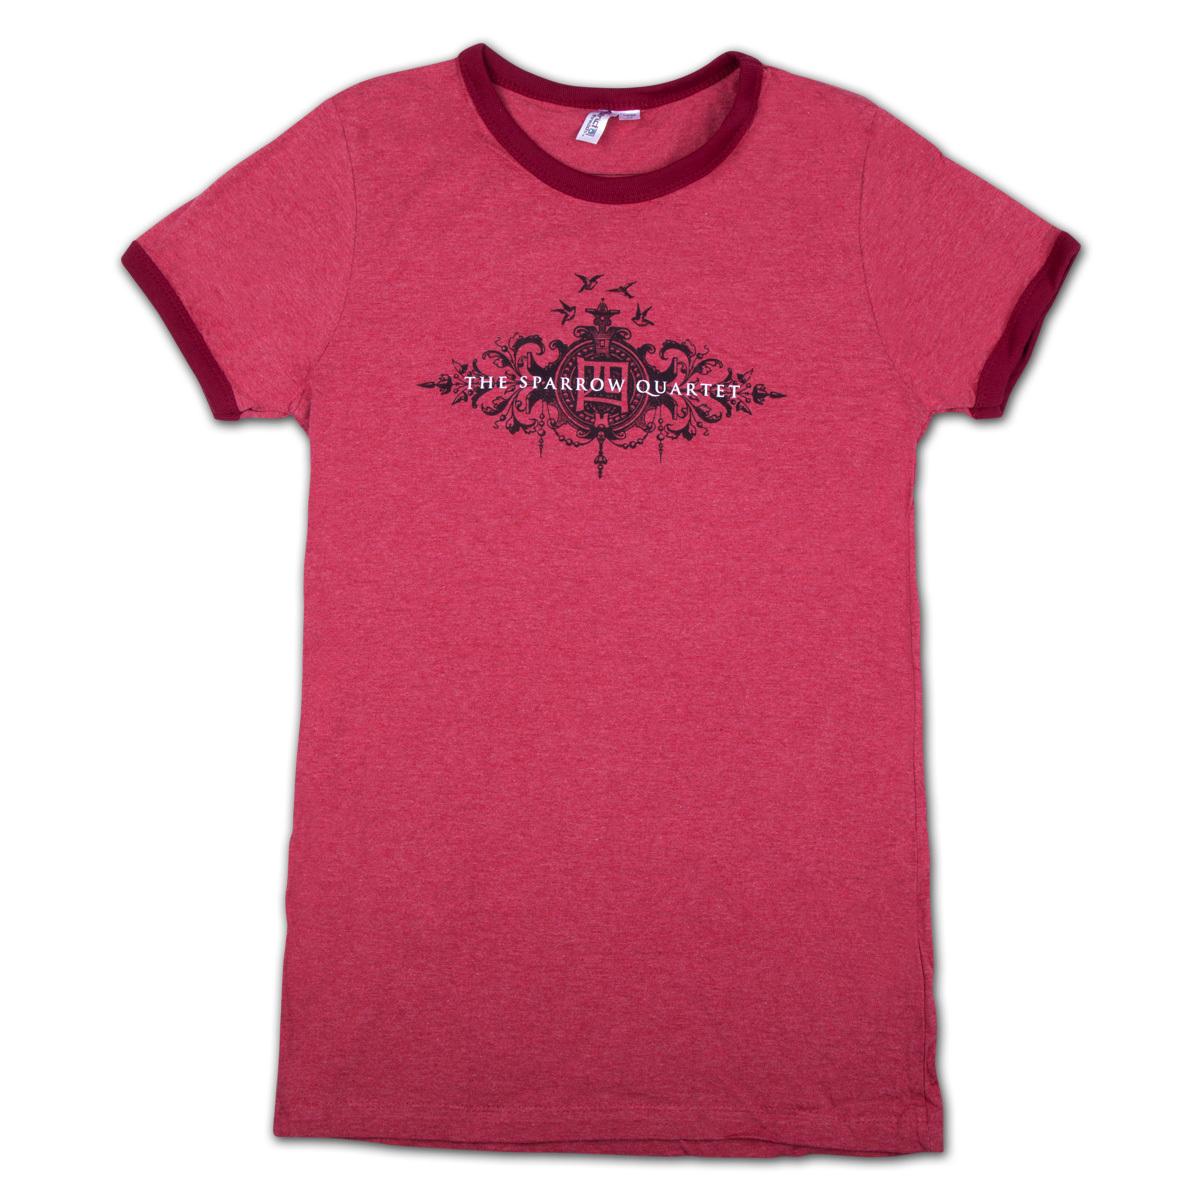 Abigail Washburn & The Sparrow Quartet Ringer T-Shirt - Ladies